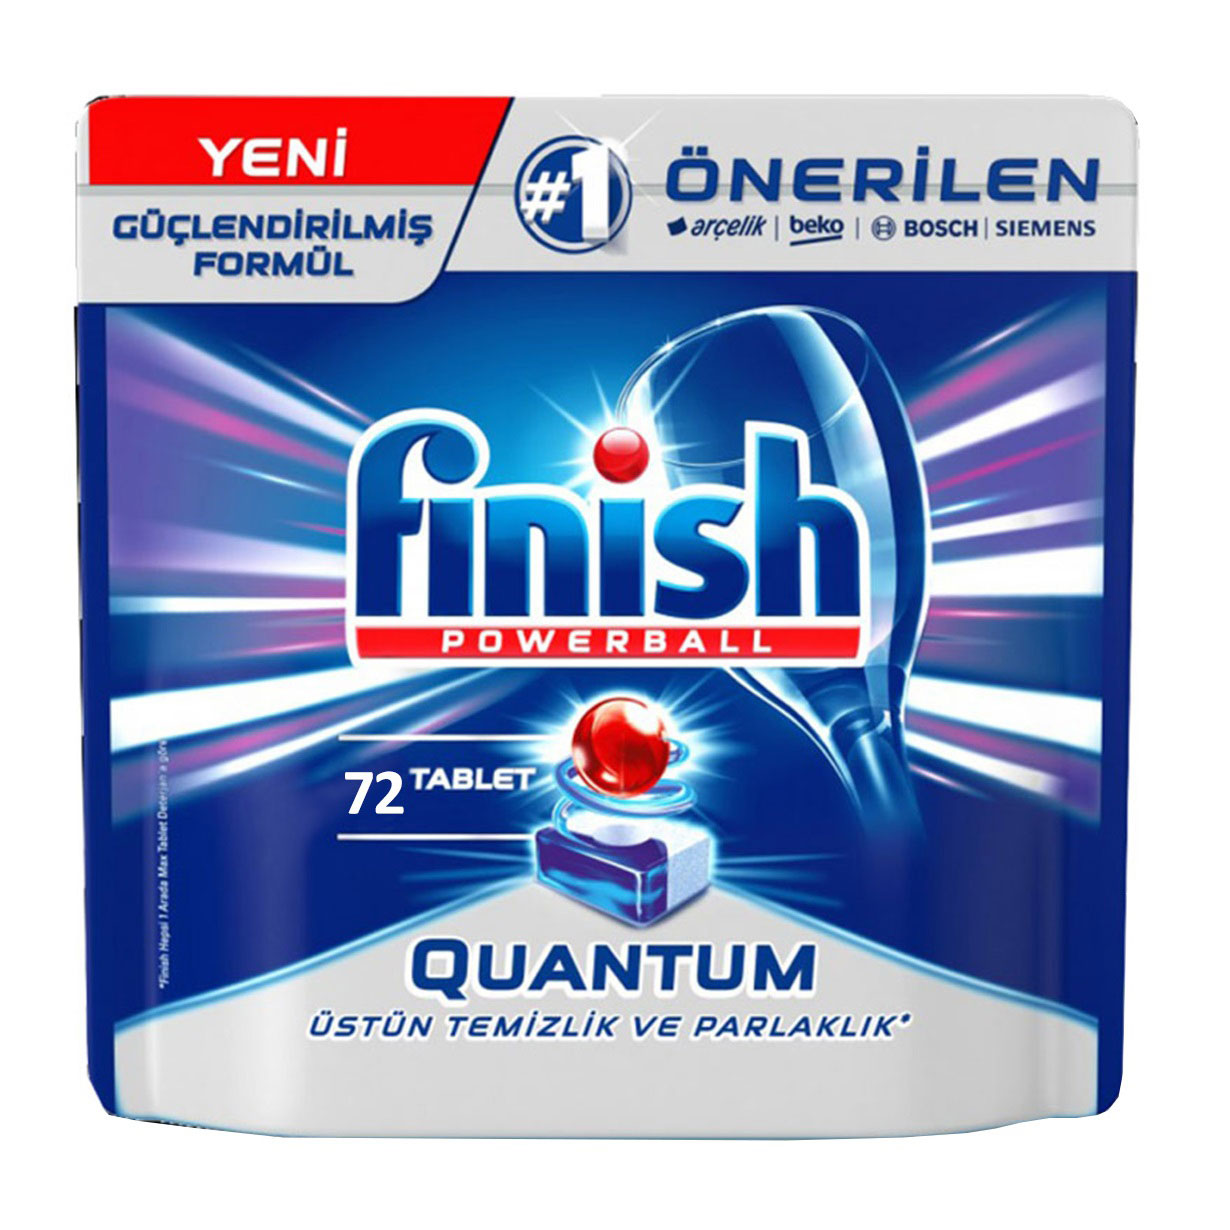 قرص ماشین ظرفشویی فینیش کوانتوم 72 عددی